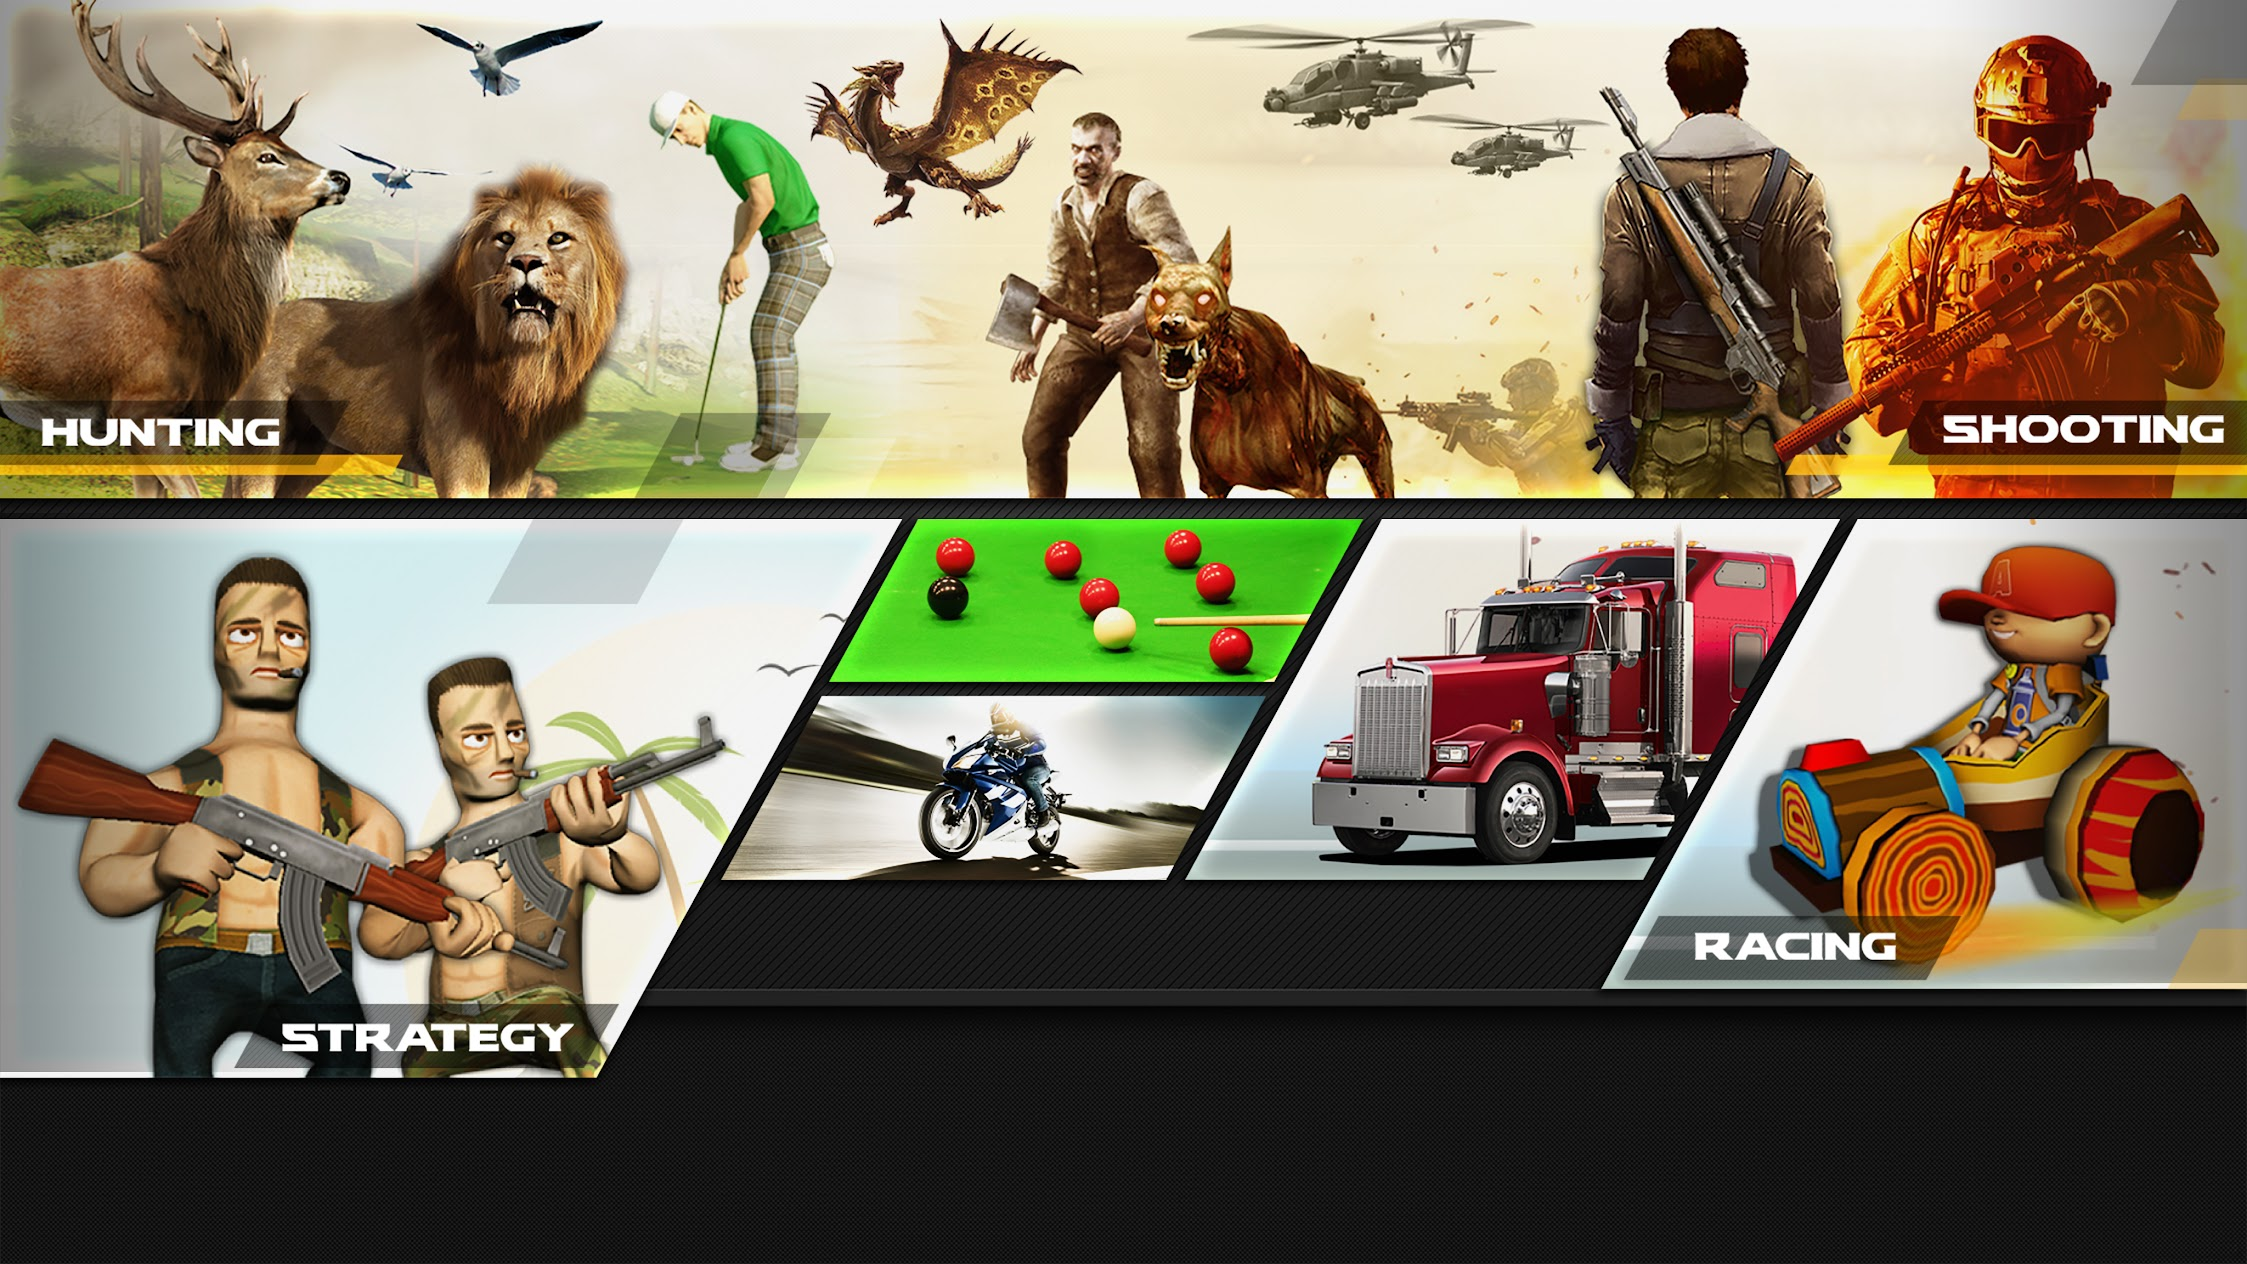 RationalVerx Games Studio